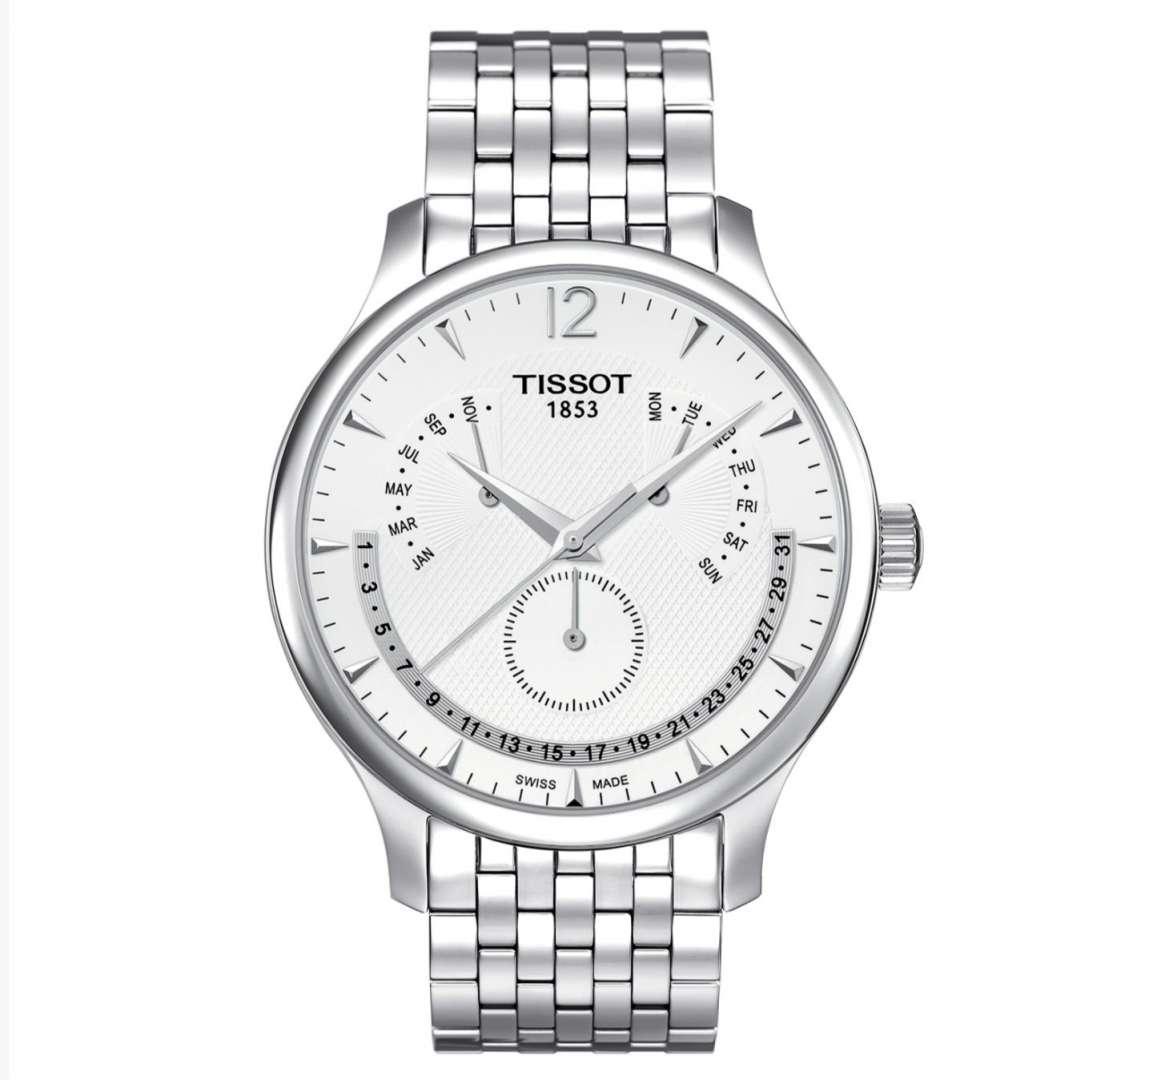 שעון יד אנלוגי tissot t063.637.11.037.00 טיסו